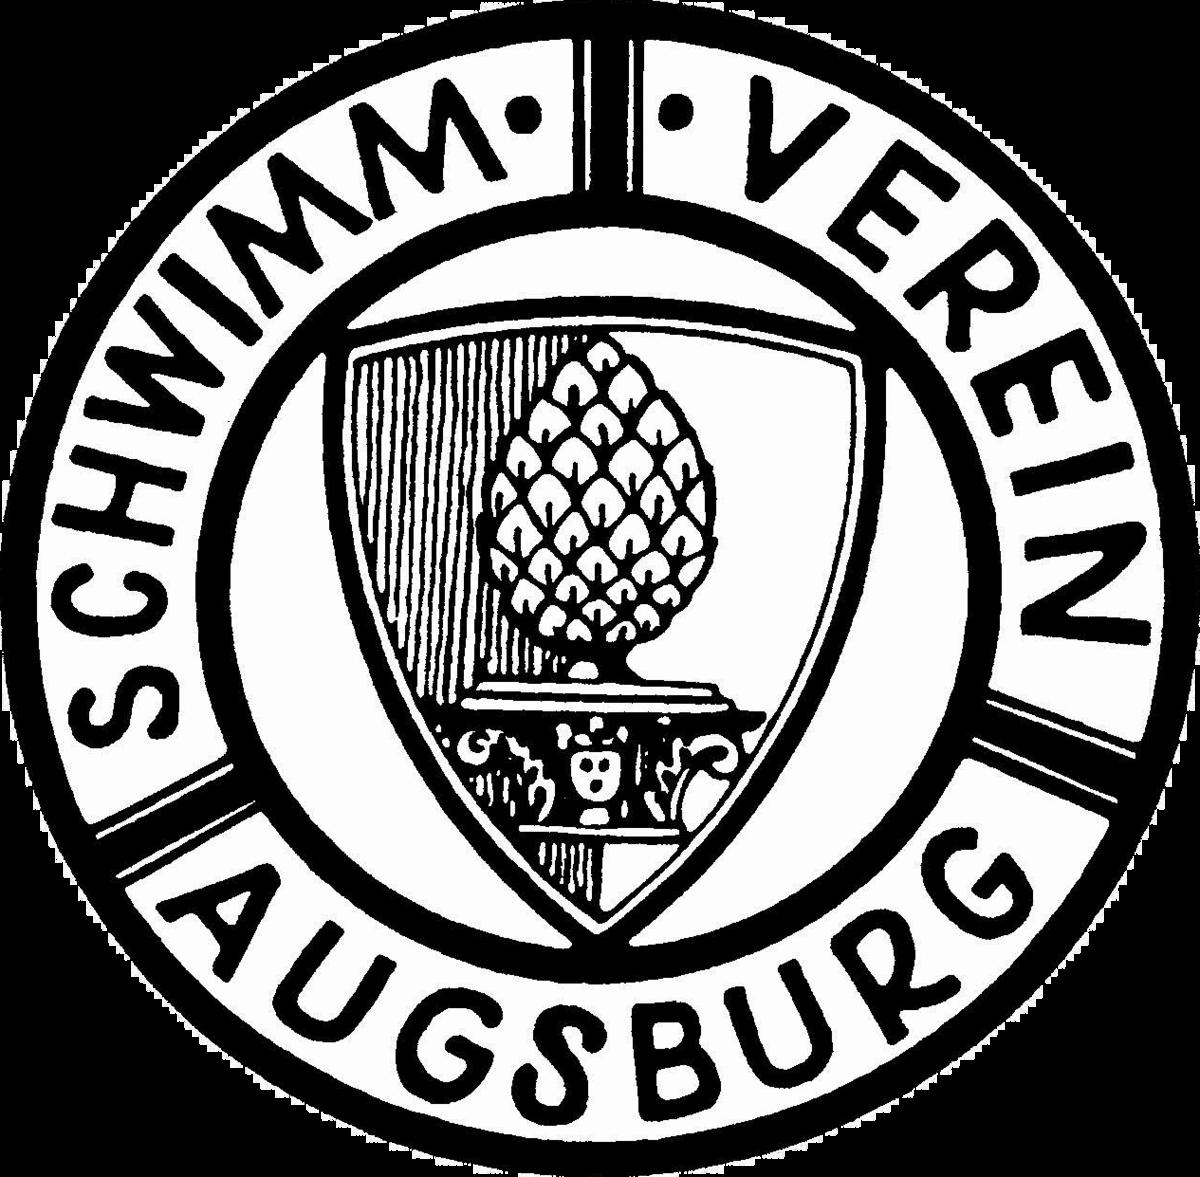 Stadtwerke Sv Augsburg